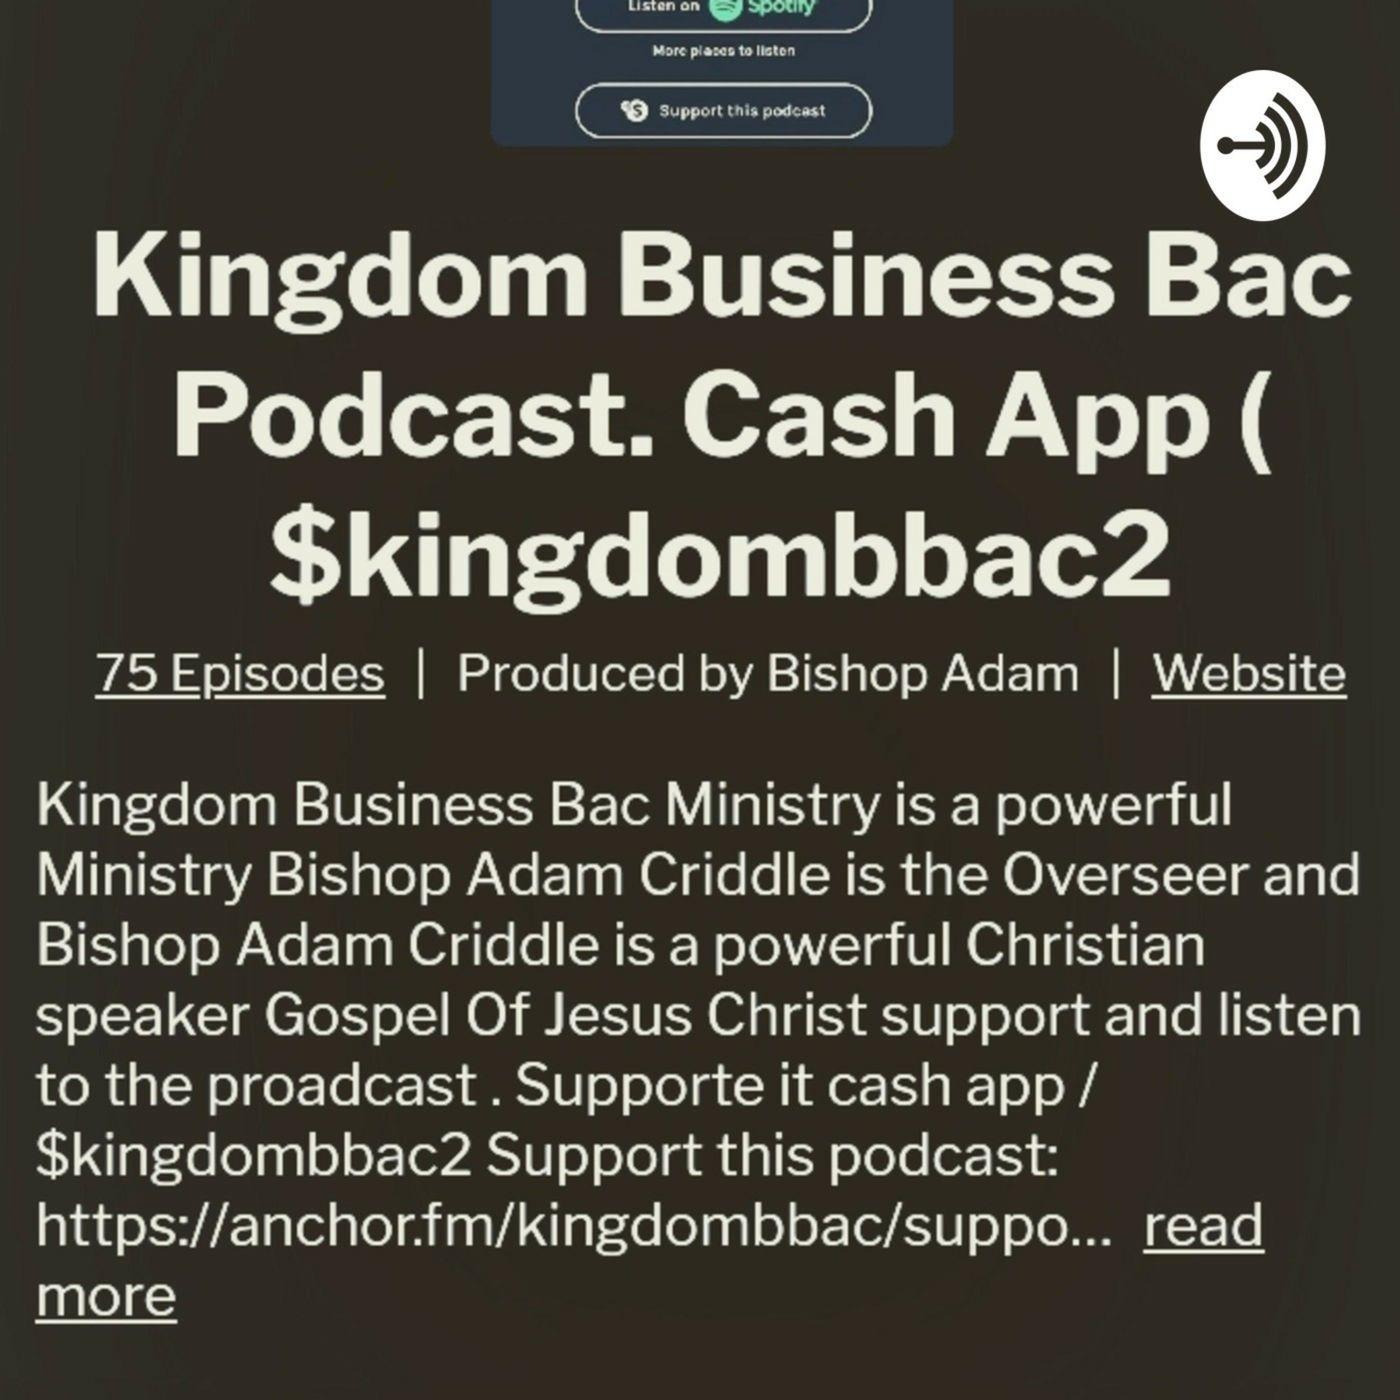 KINGDOM BUSINESS Bac Ministry's show